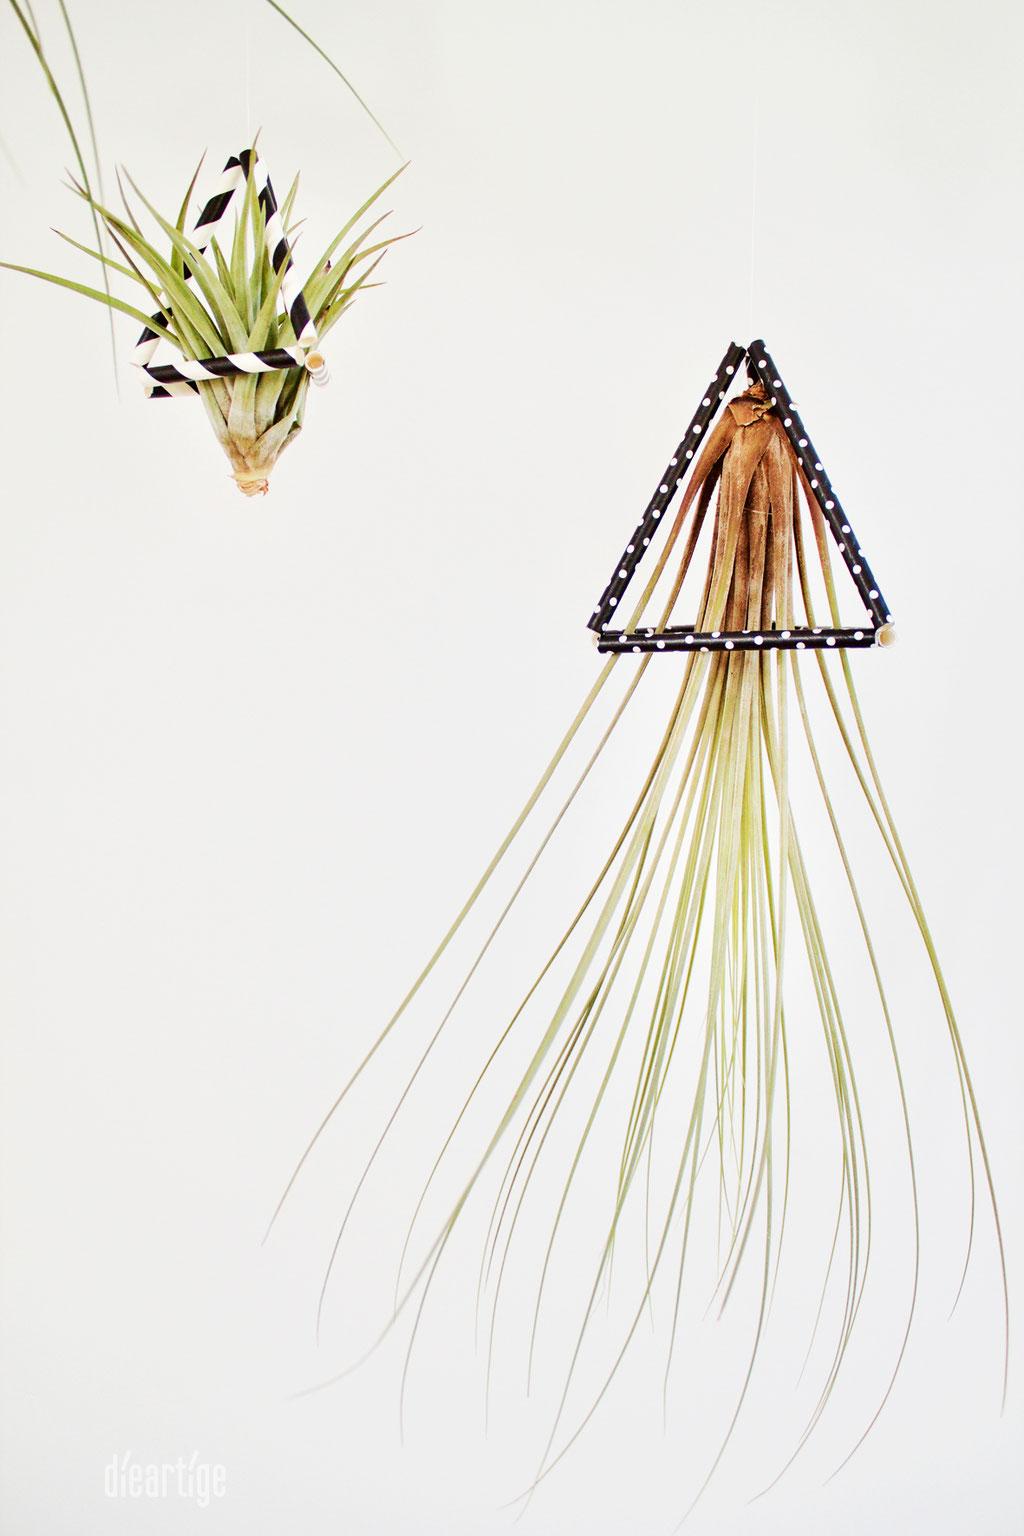 dieartigeBLOG - DIY / Tillandsien im modernen Quallenlook